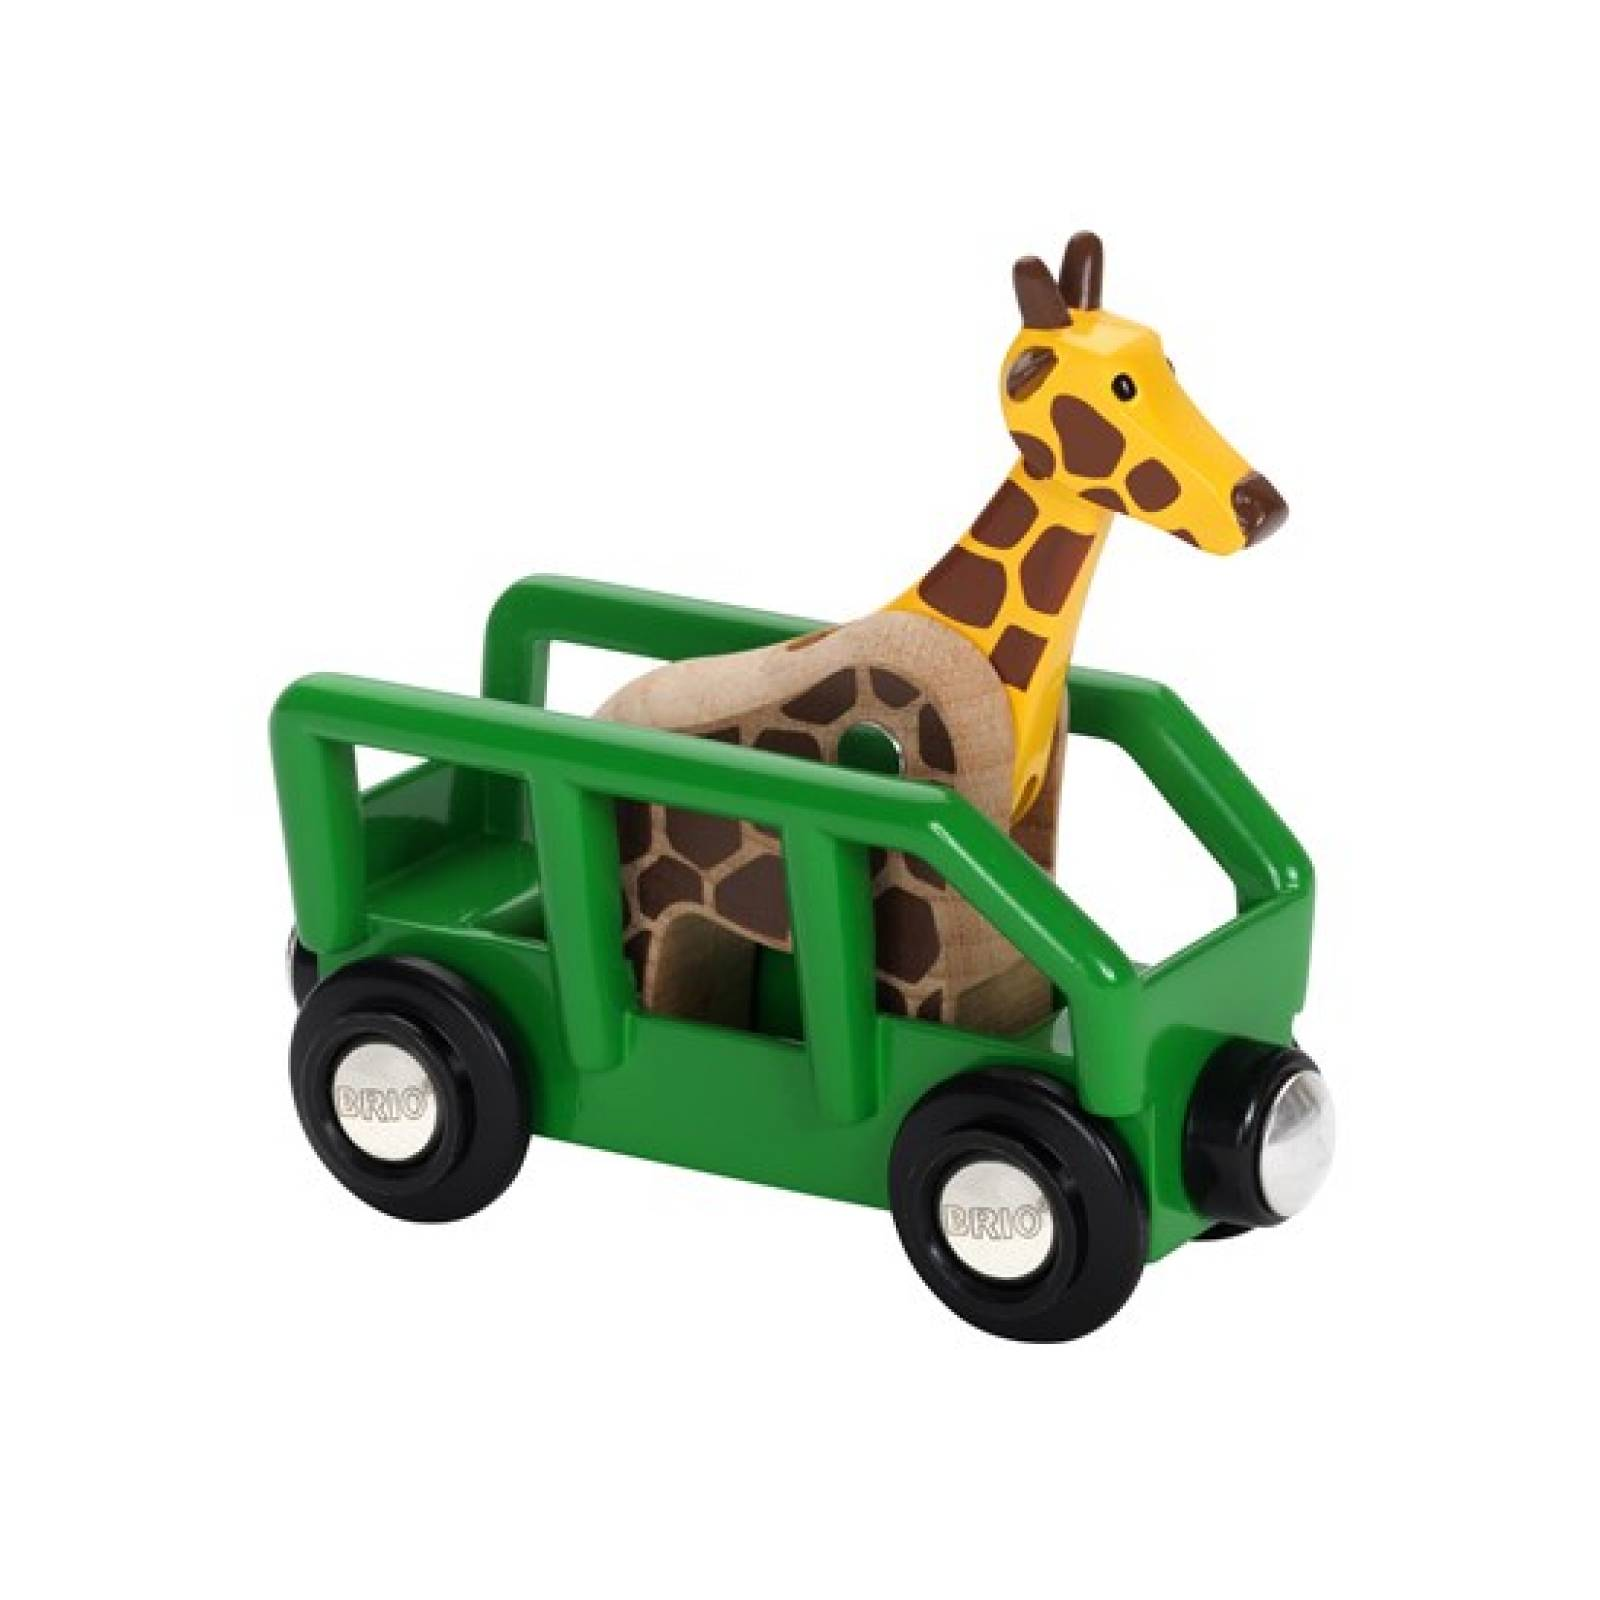 Giraffe and Wagon BRIO Wooden Railway Age 3+ thumbnails